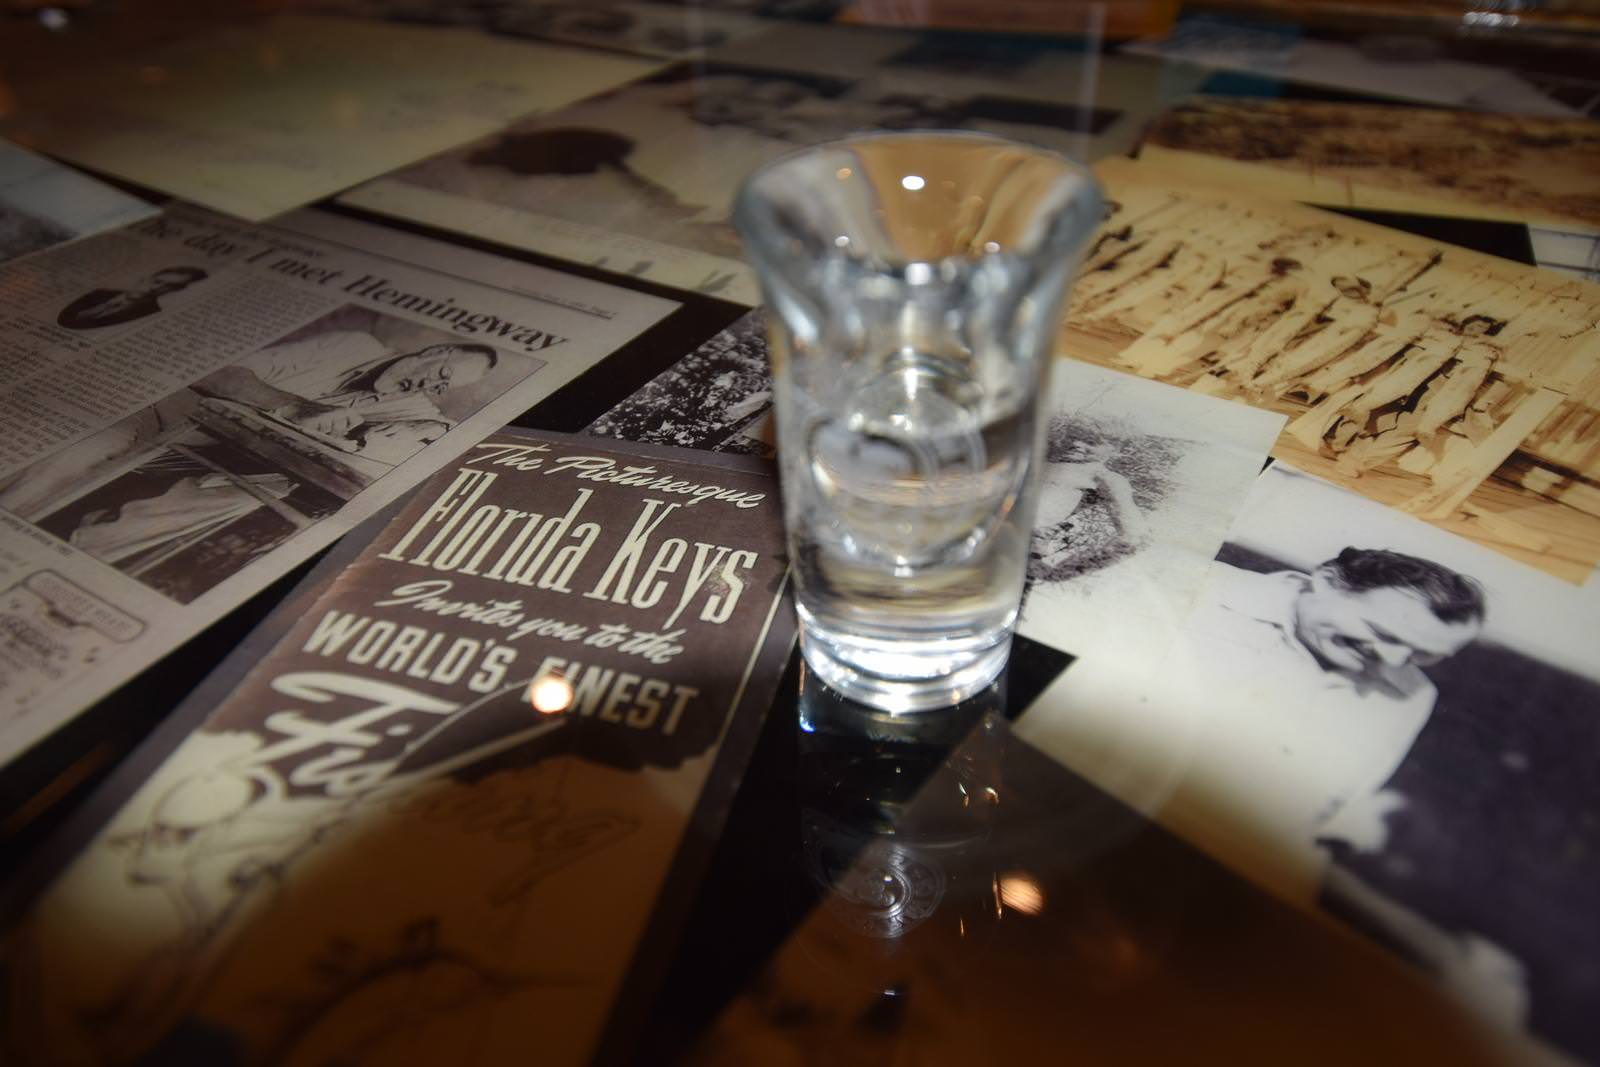 Papa's Pilar Rum Key West 13